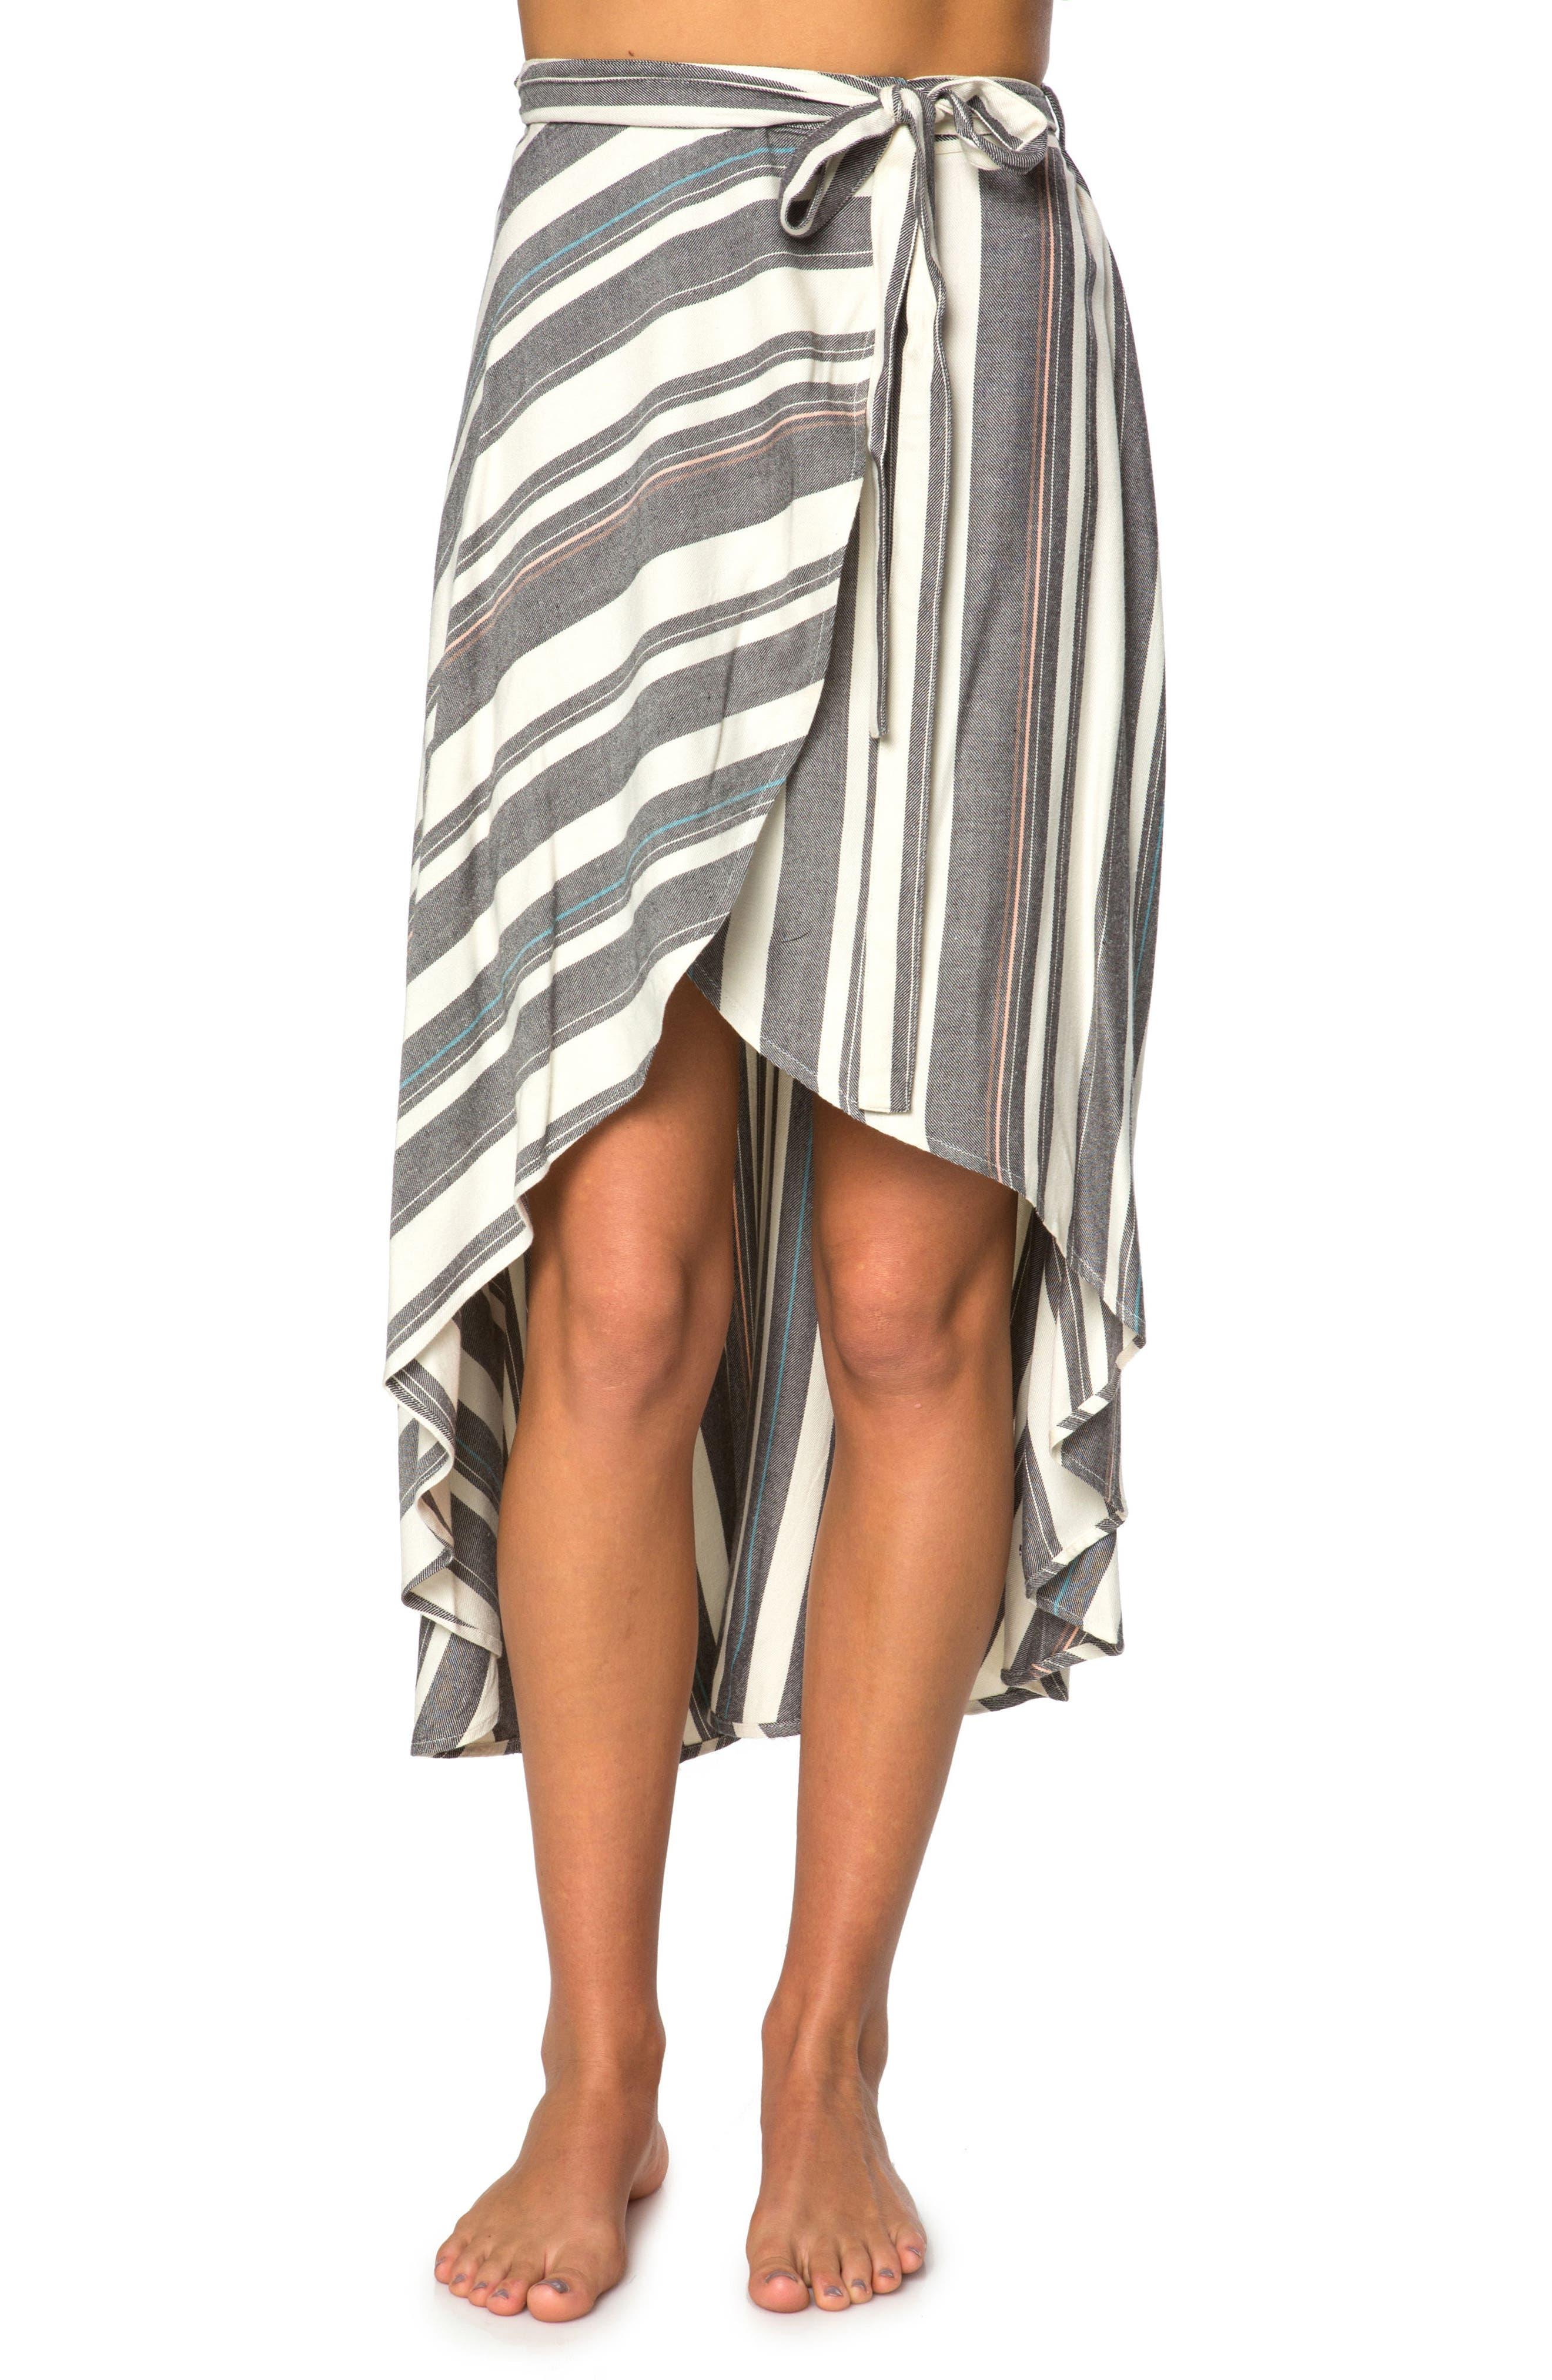 x Natalie Off Duty Savi Woven Skirt,                         Main,                         color, Multi Color